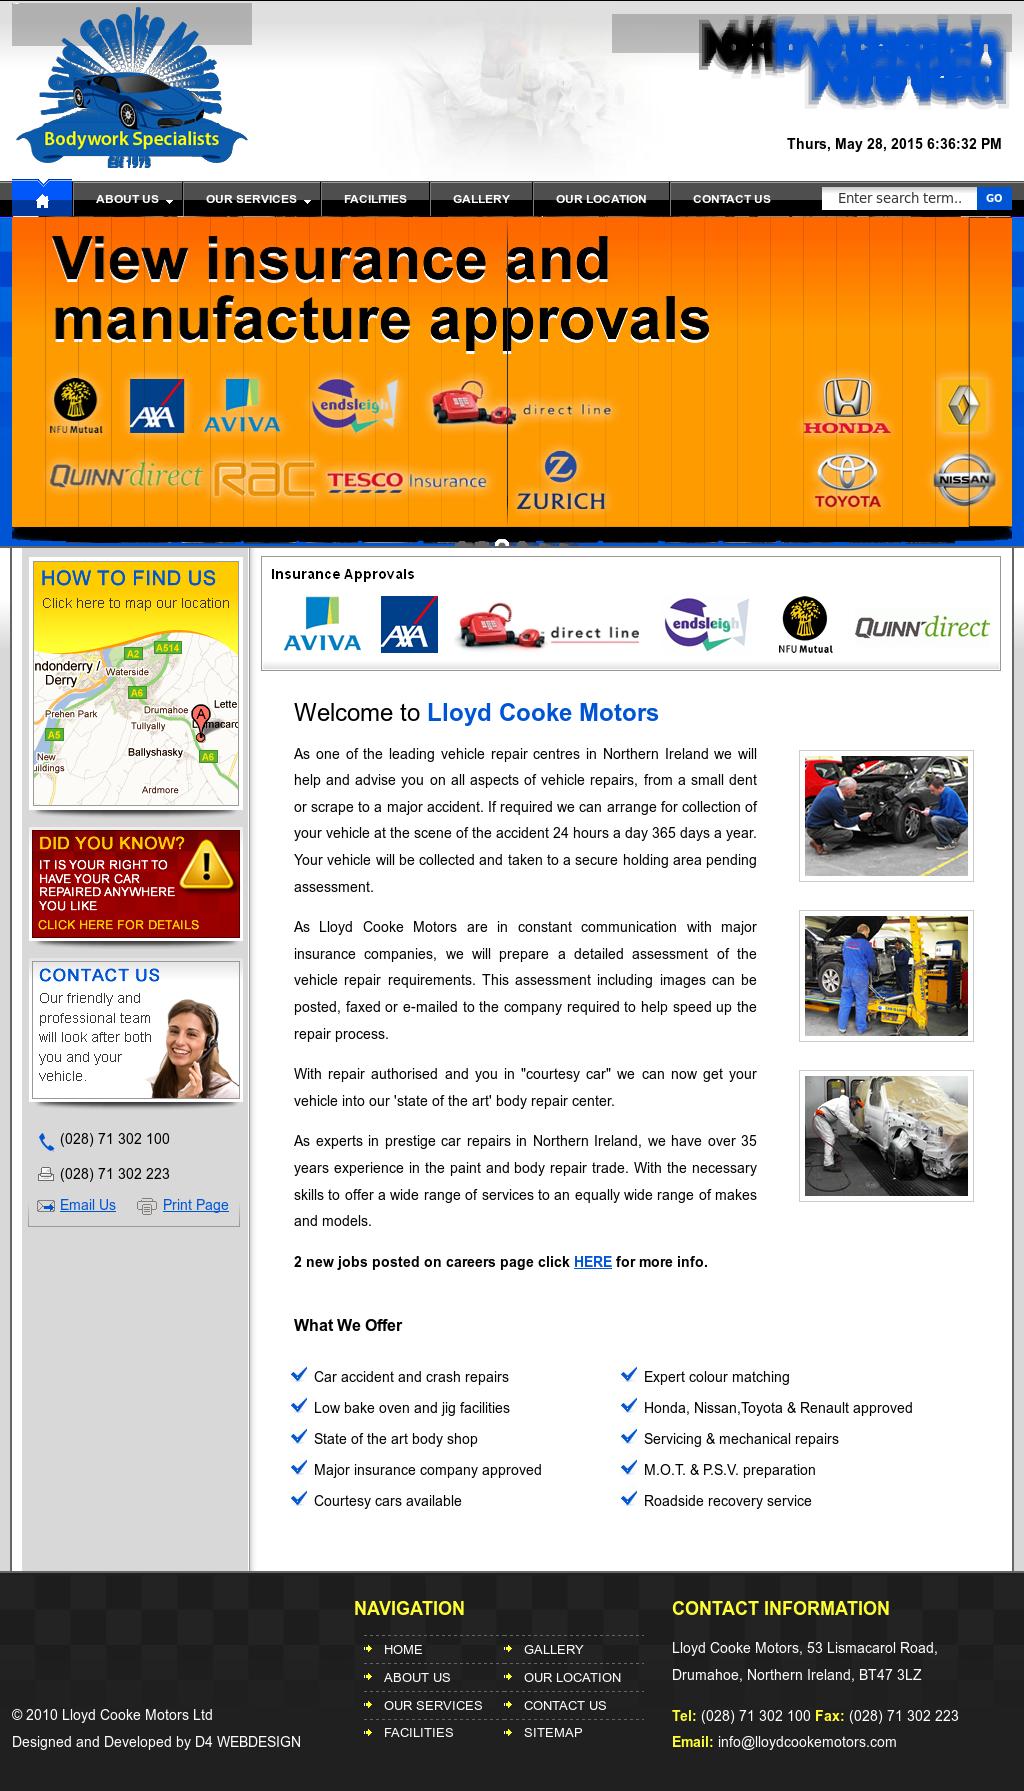 Lloyd Cooke Motors Competitors, Revenue and Employees - Owler Company Profile